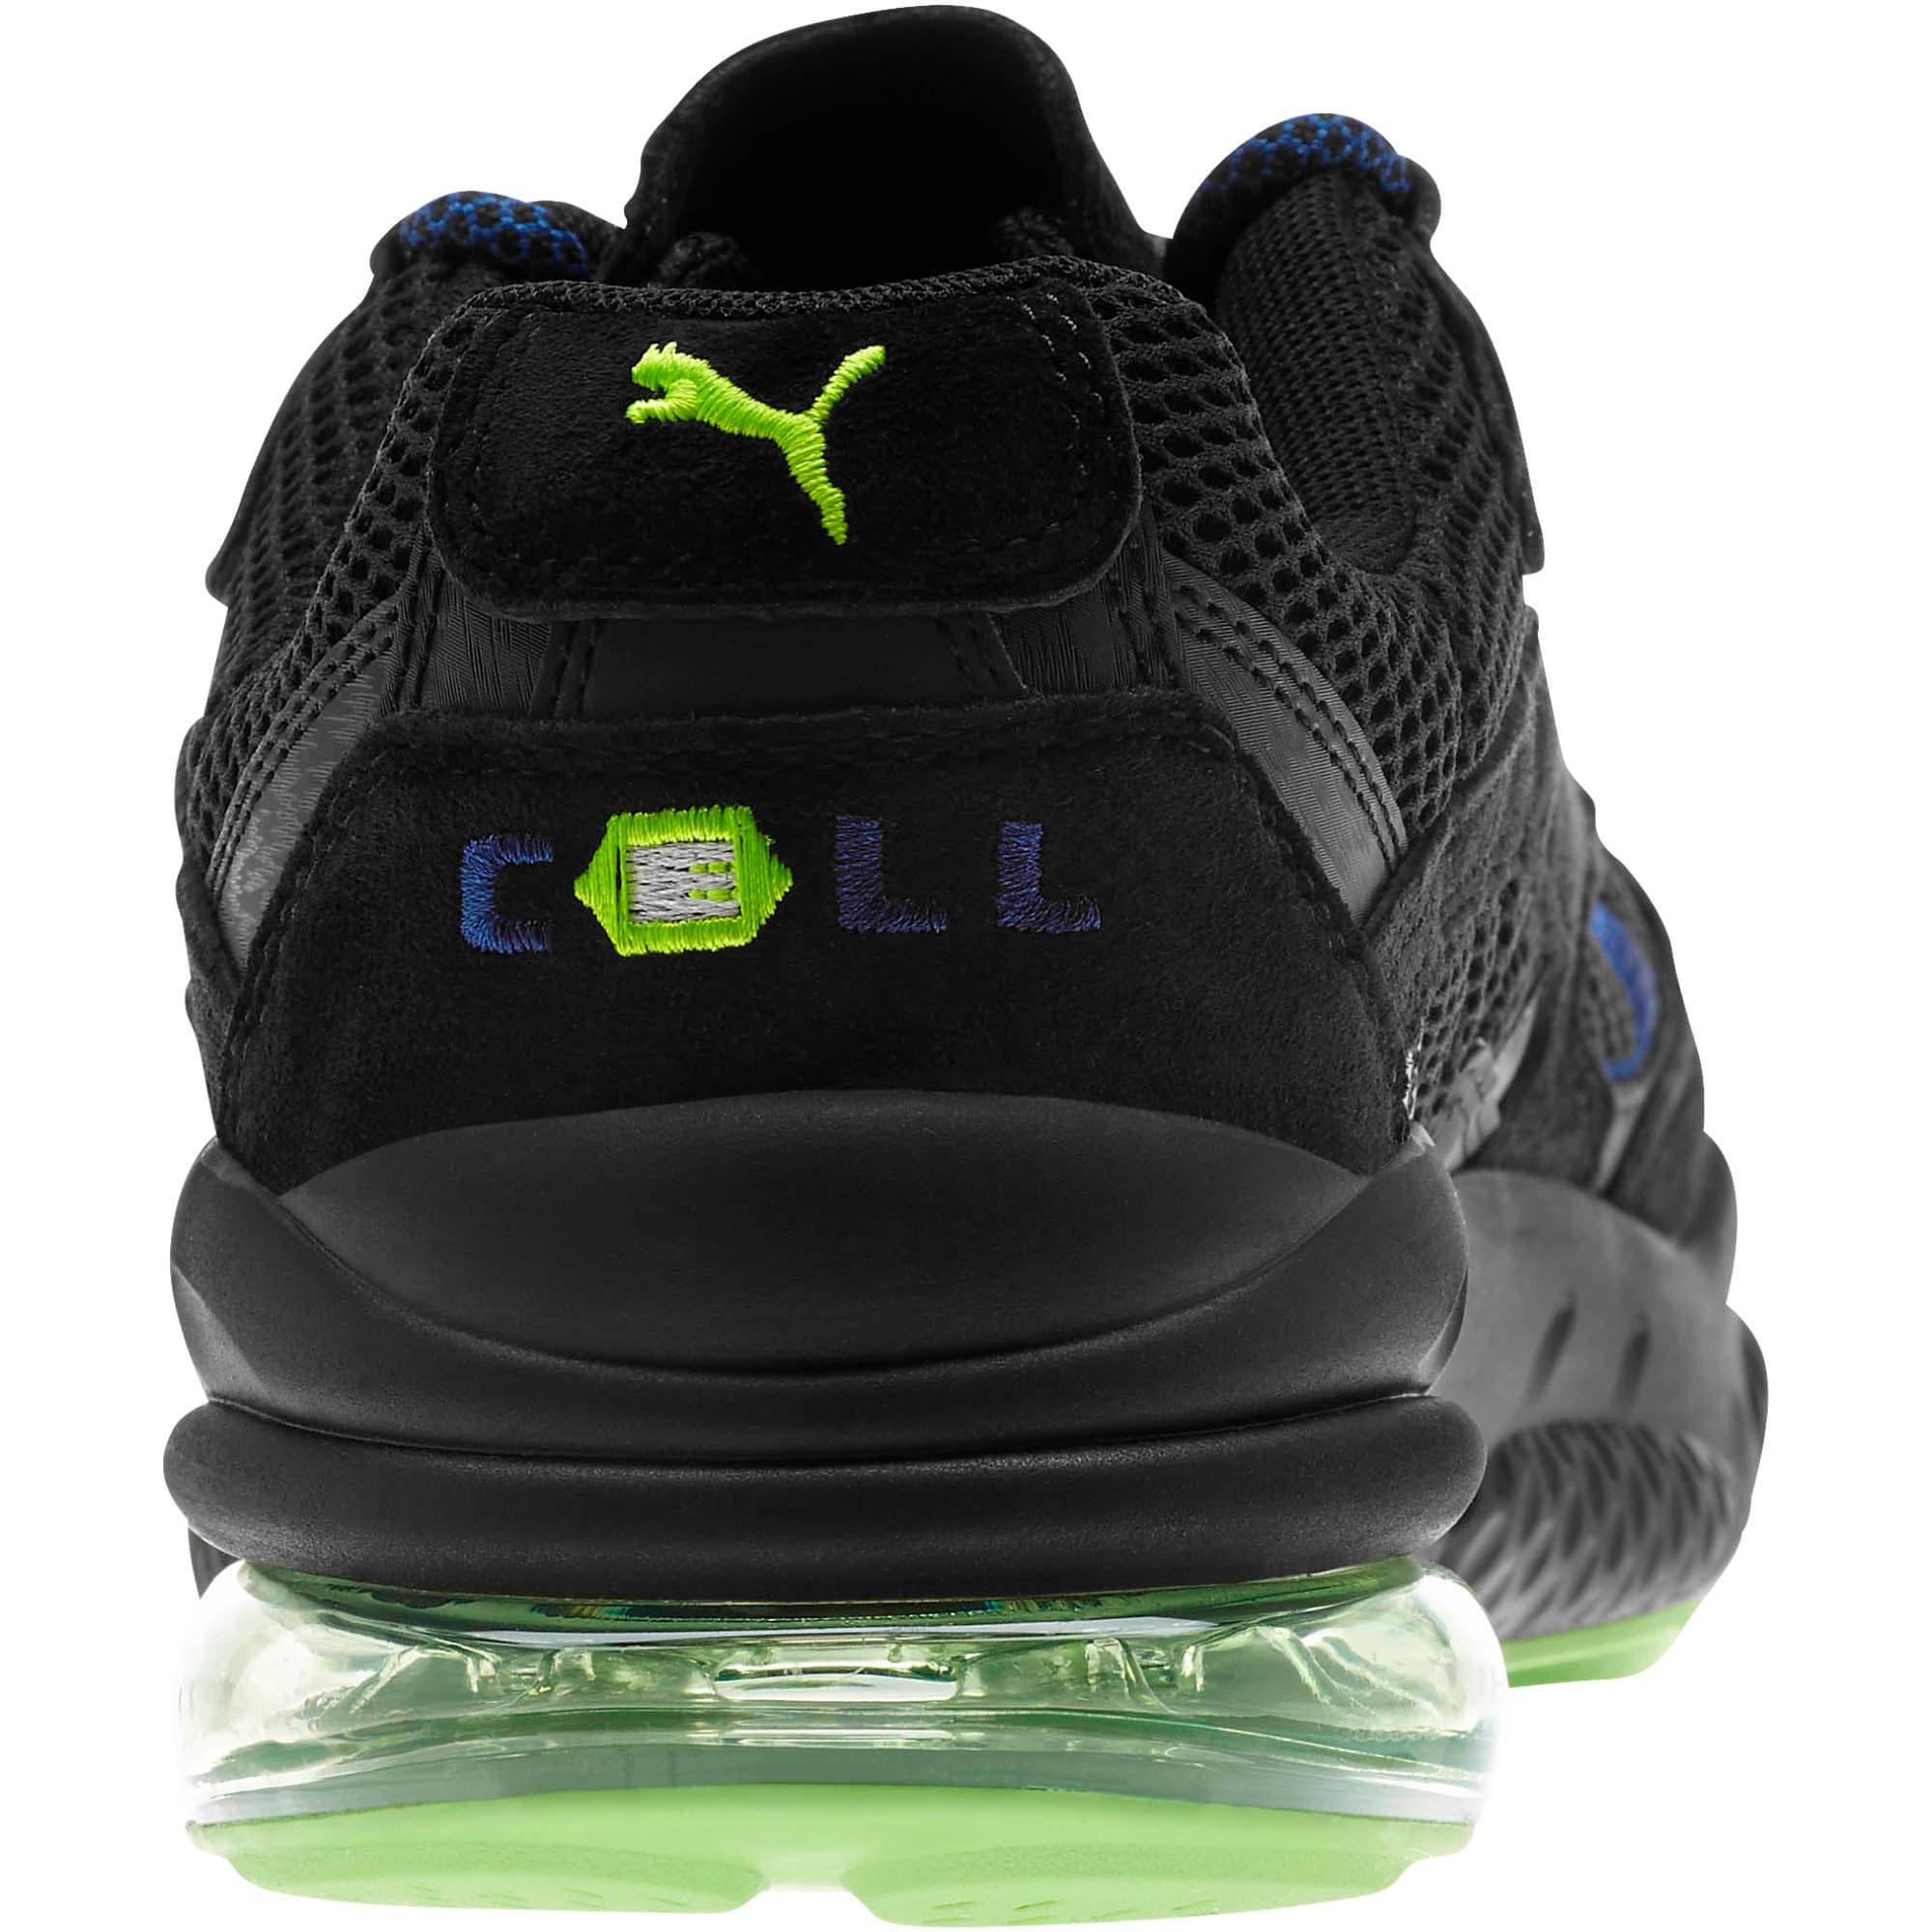 Thumbnail 3 of CELL Venom NV Sneakers, Puma Black-Surf The Web, medium